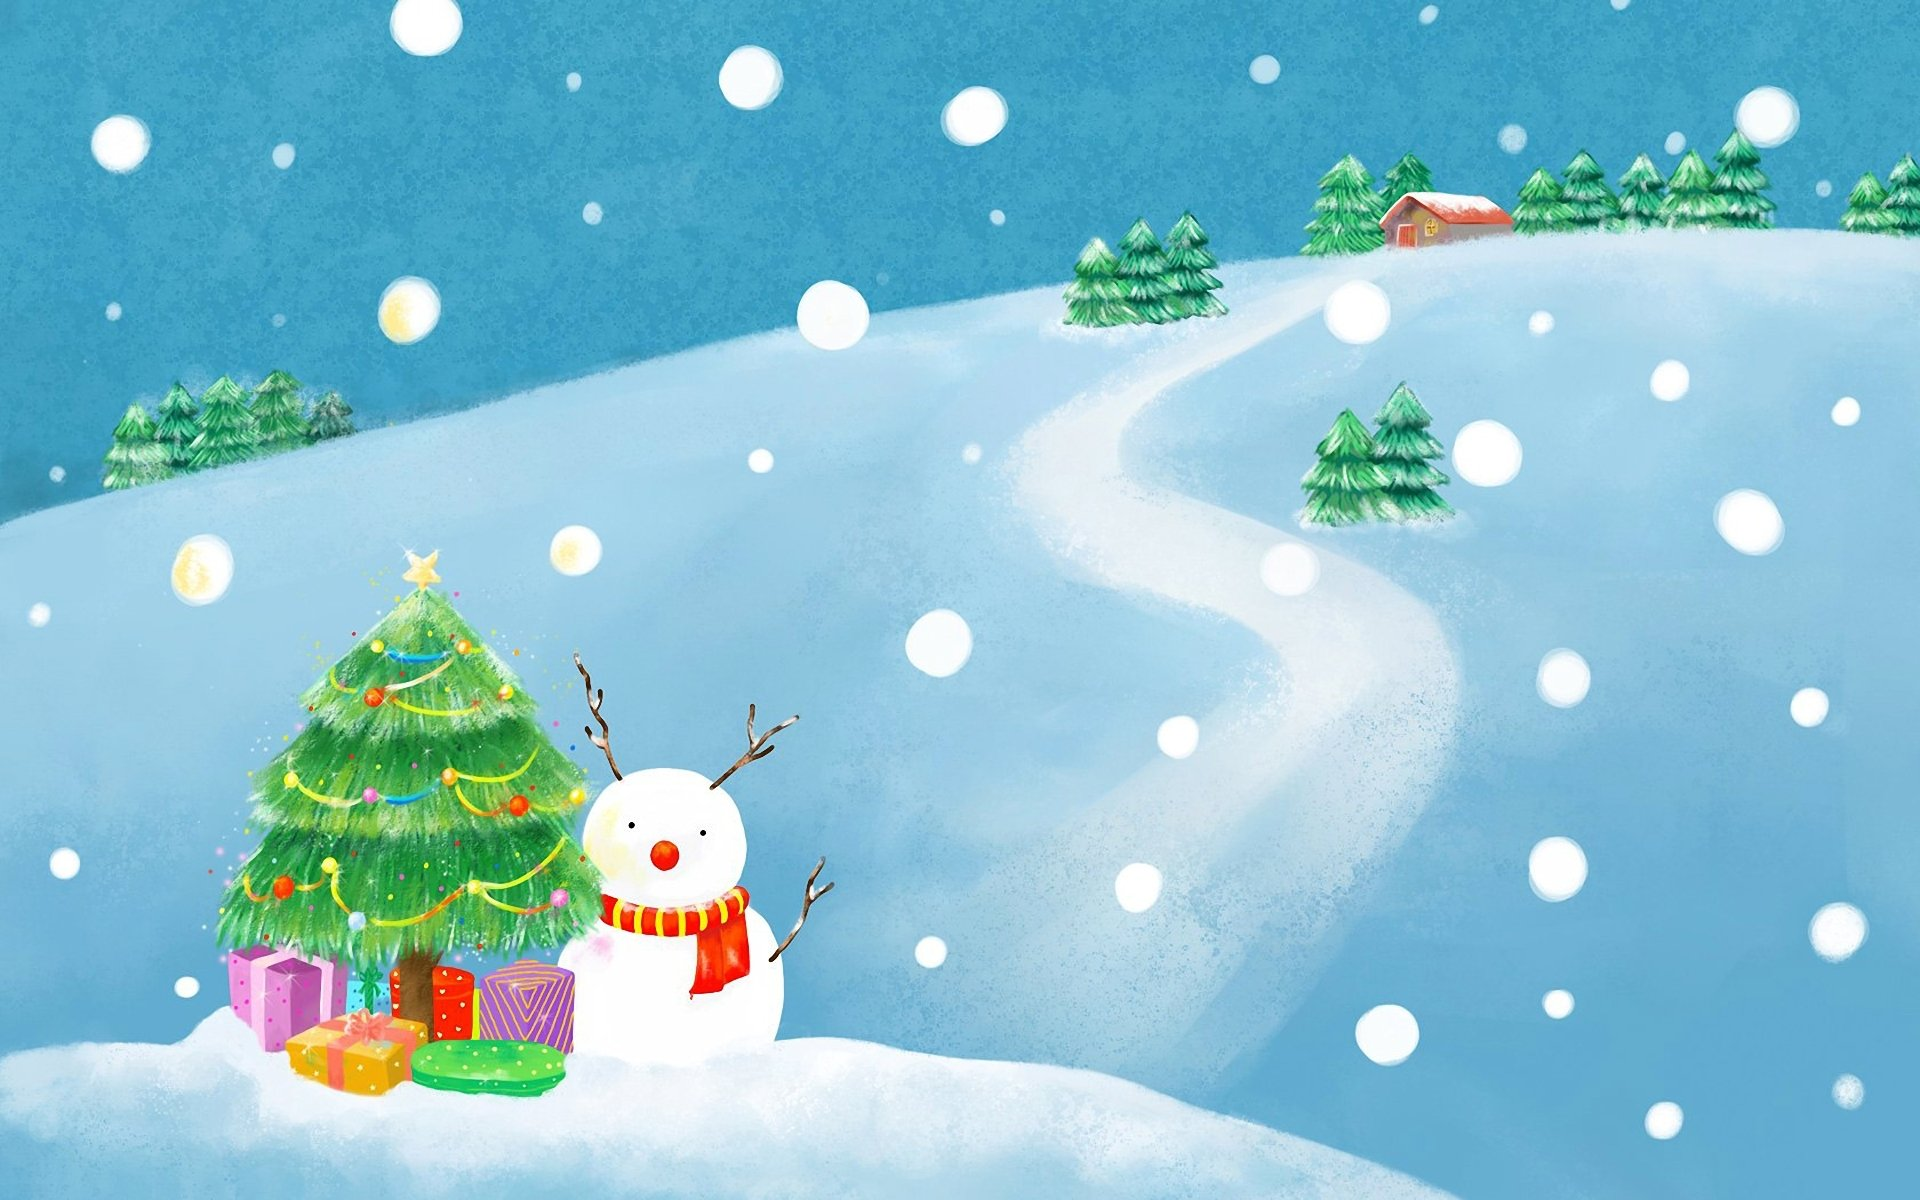 Рисунок на зимнюю тематику для детского сада